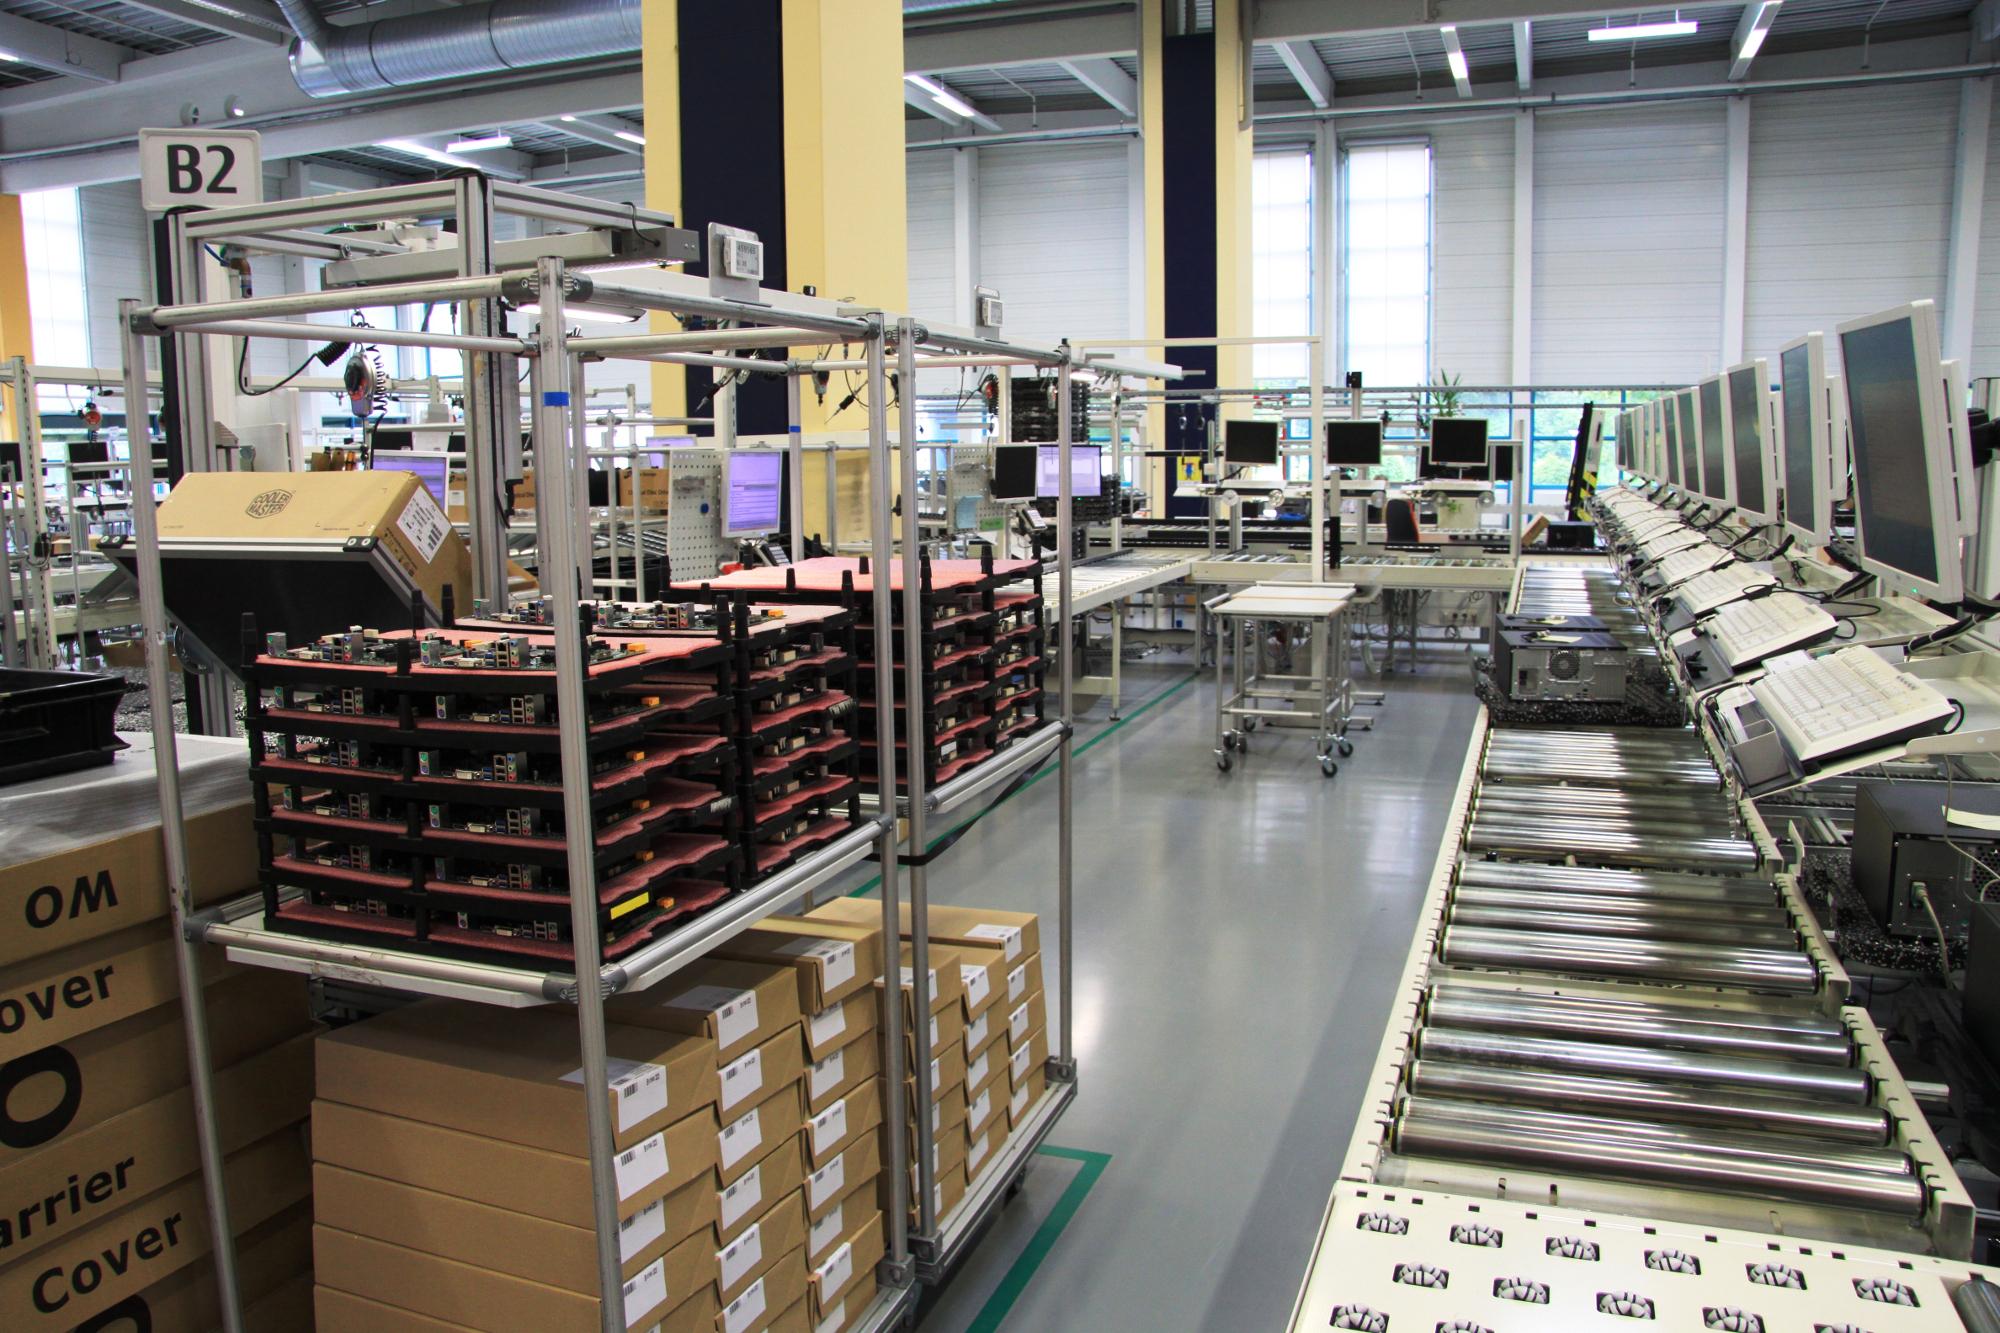 (Bild: Lancom Systems GmbH)